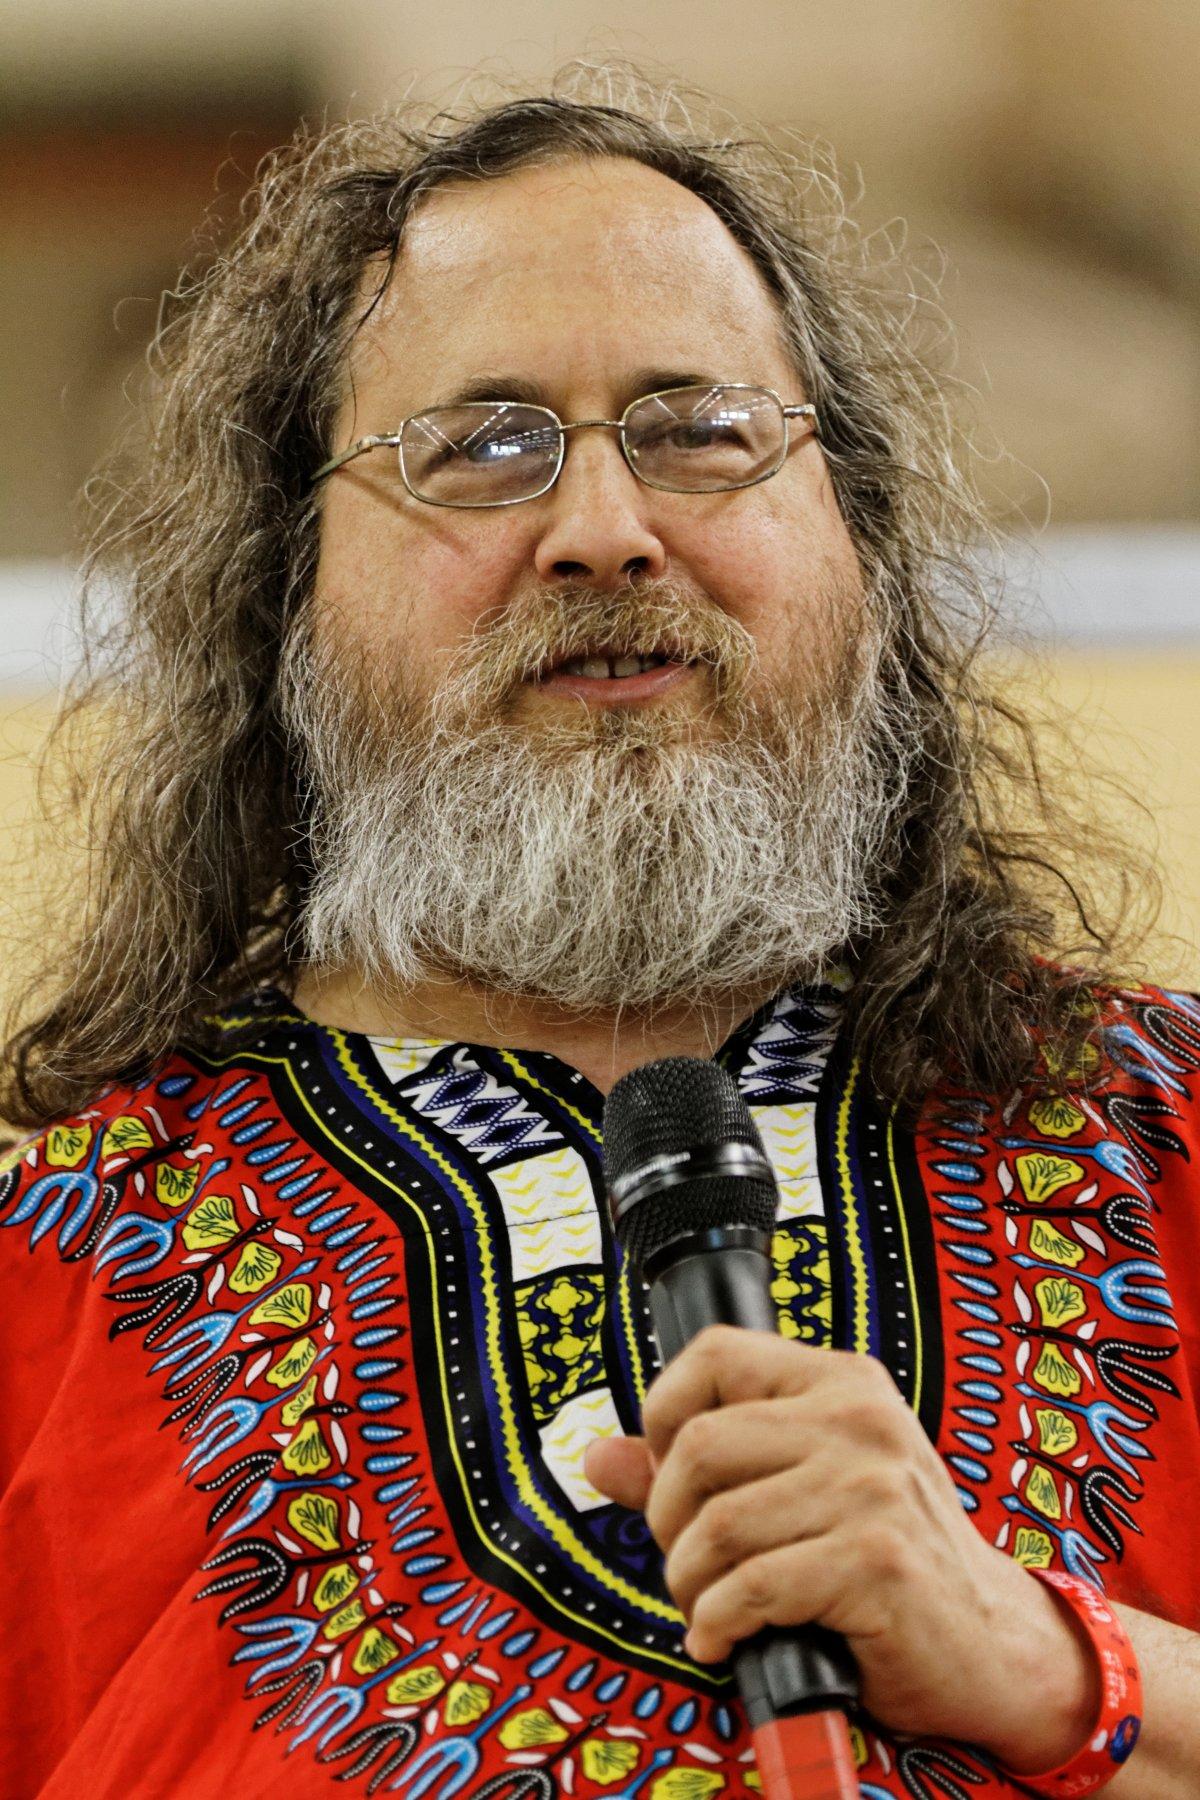 Richard Stallman, software freedom fighter